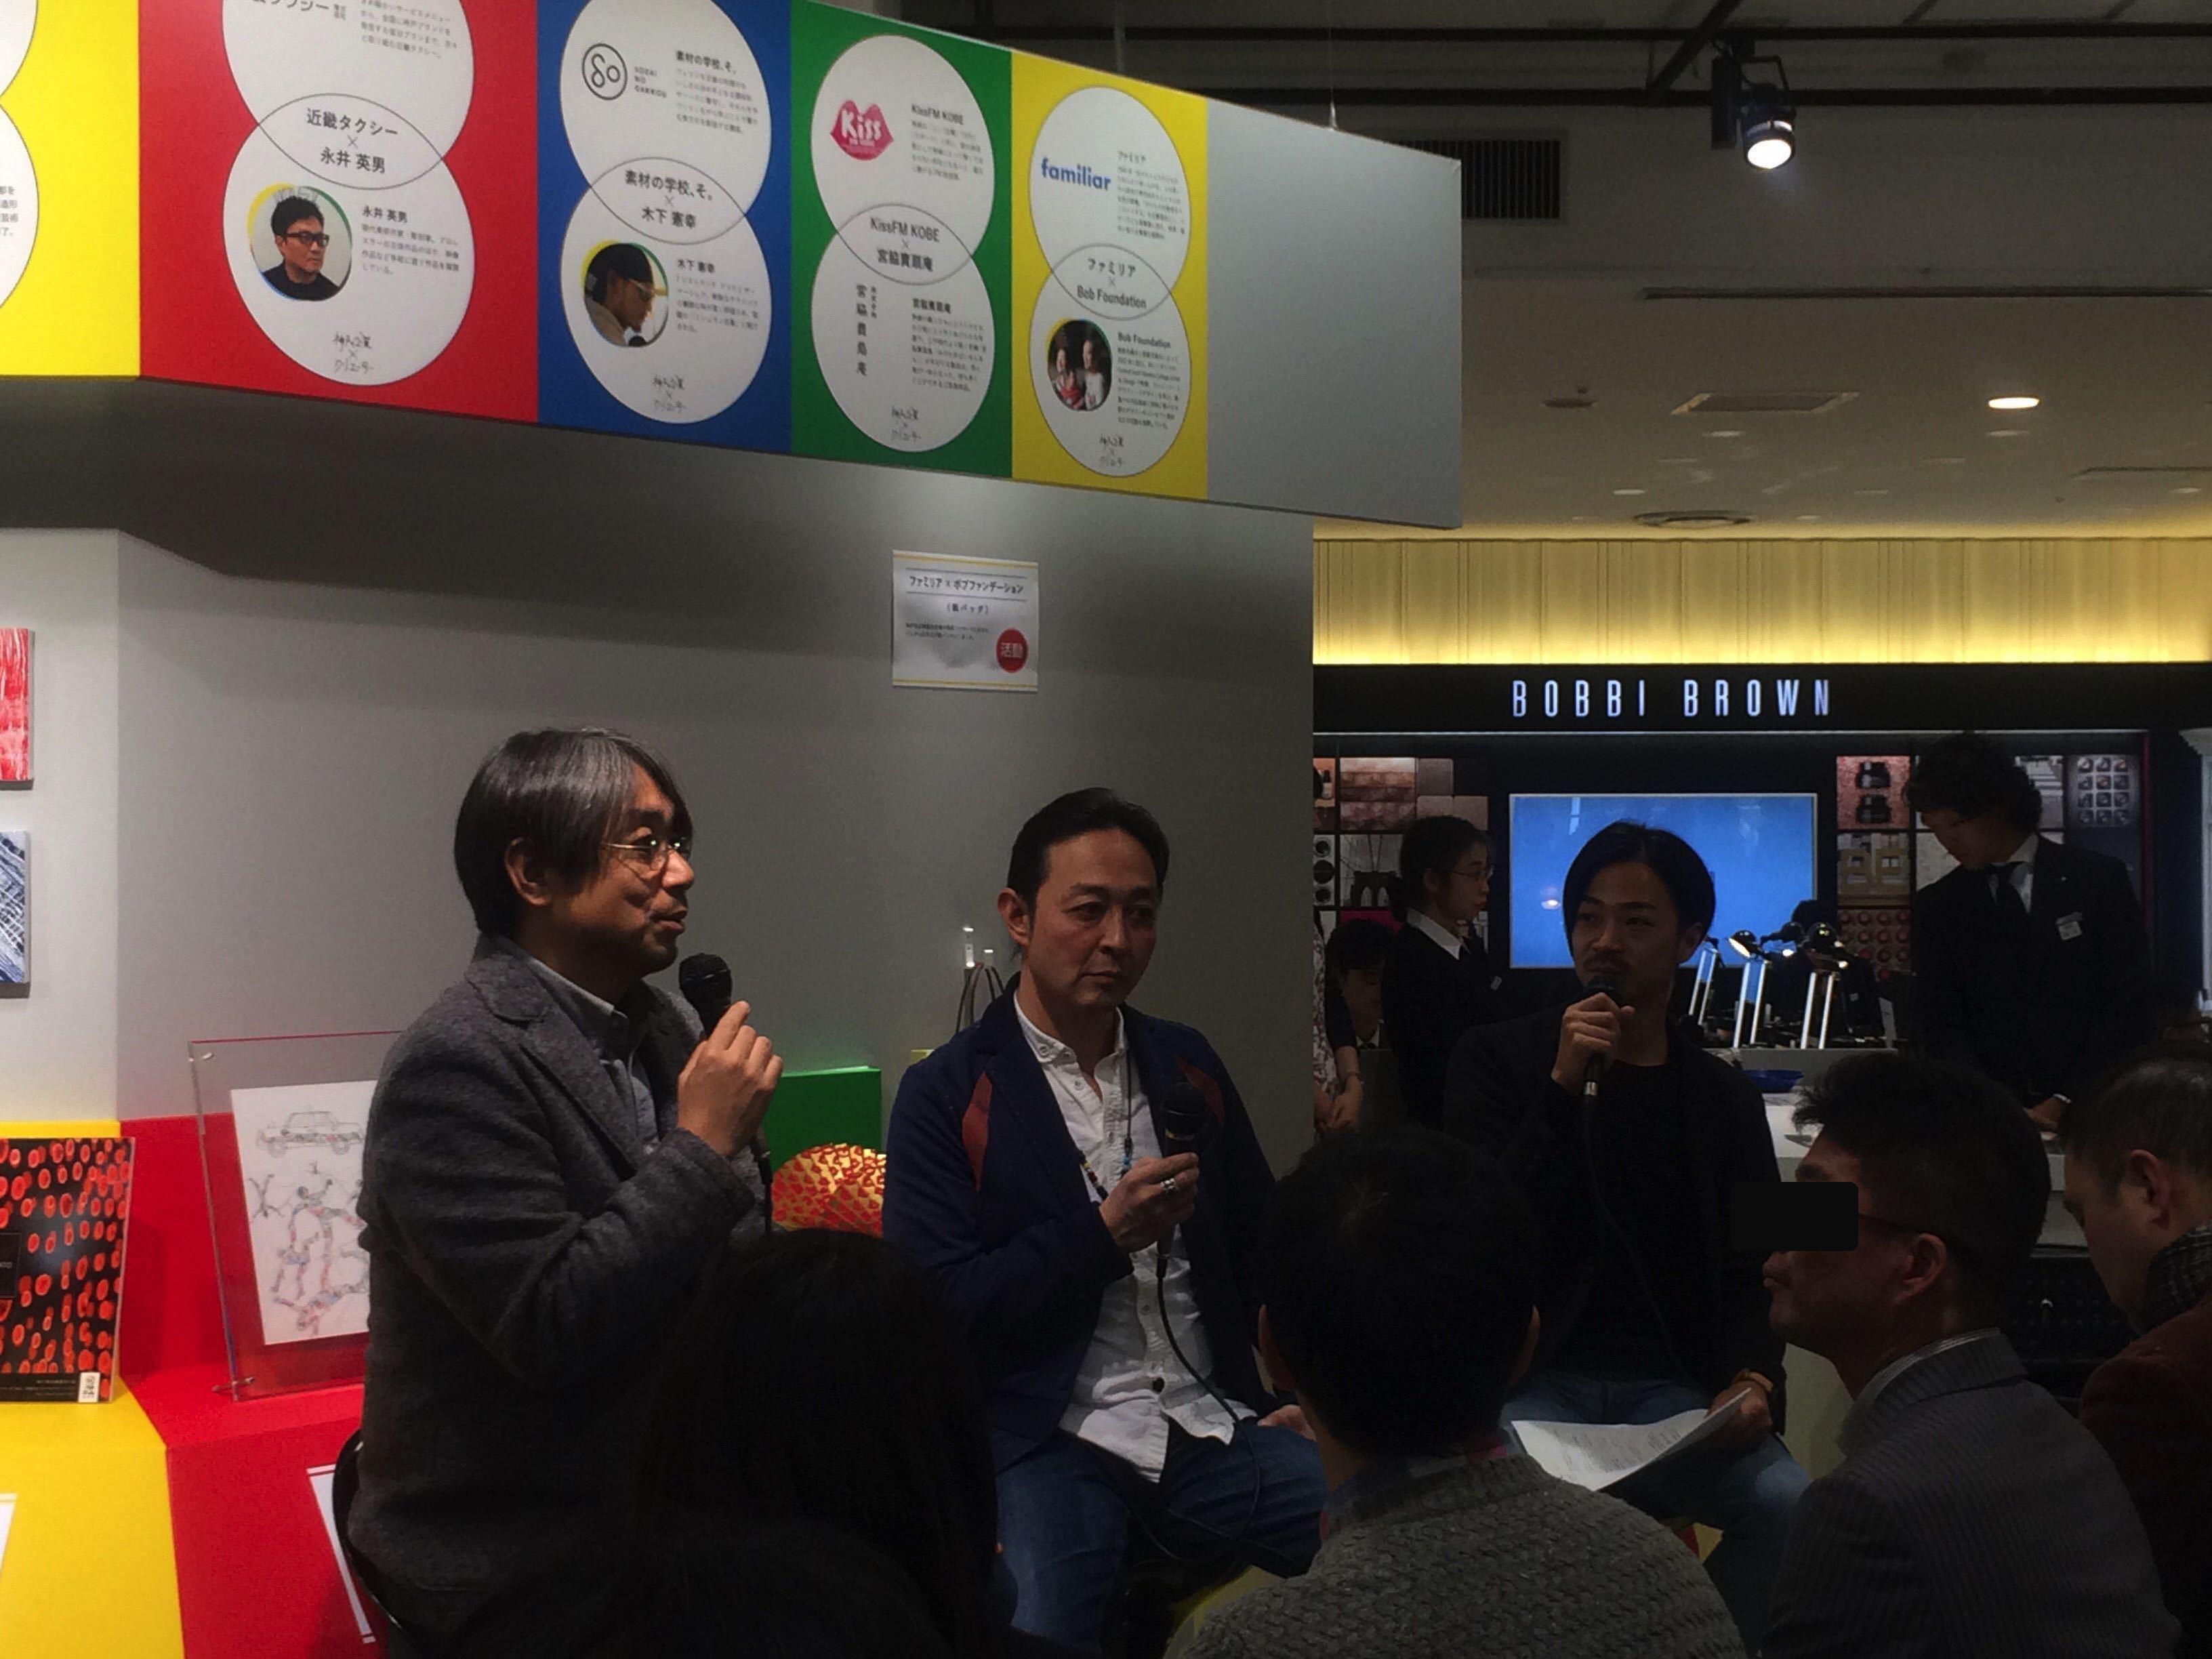 20170128神戸別品博覧会東京トークショー